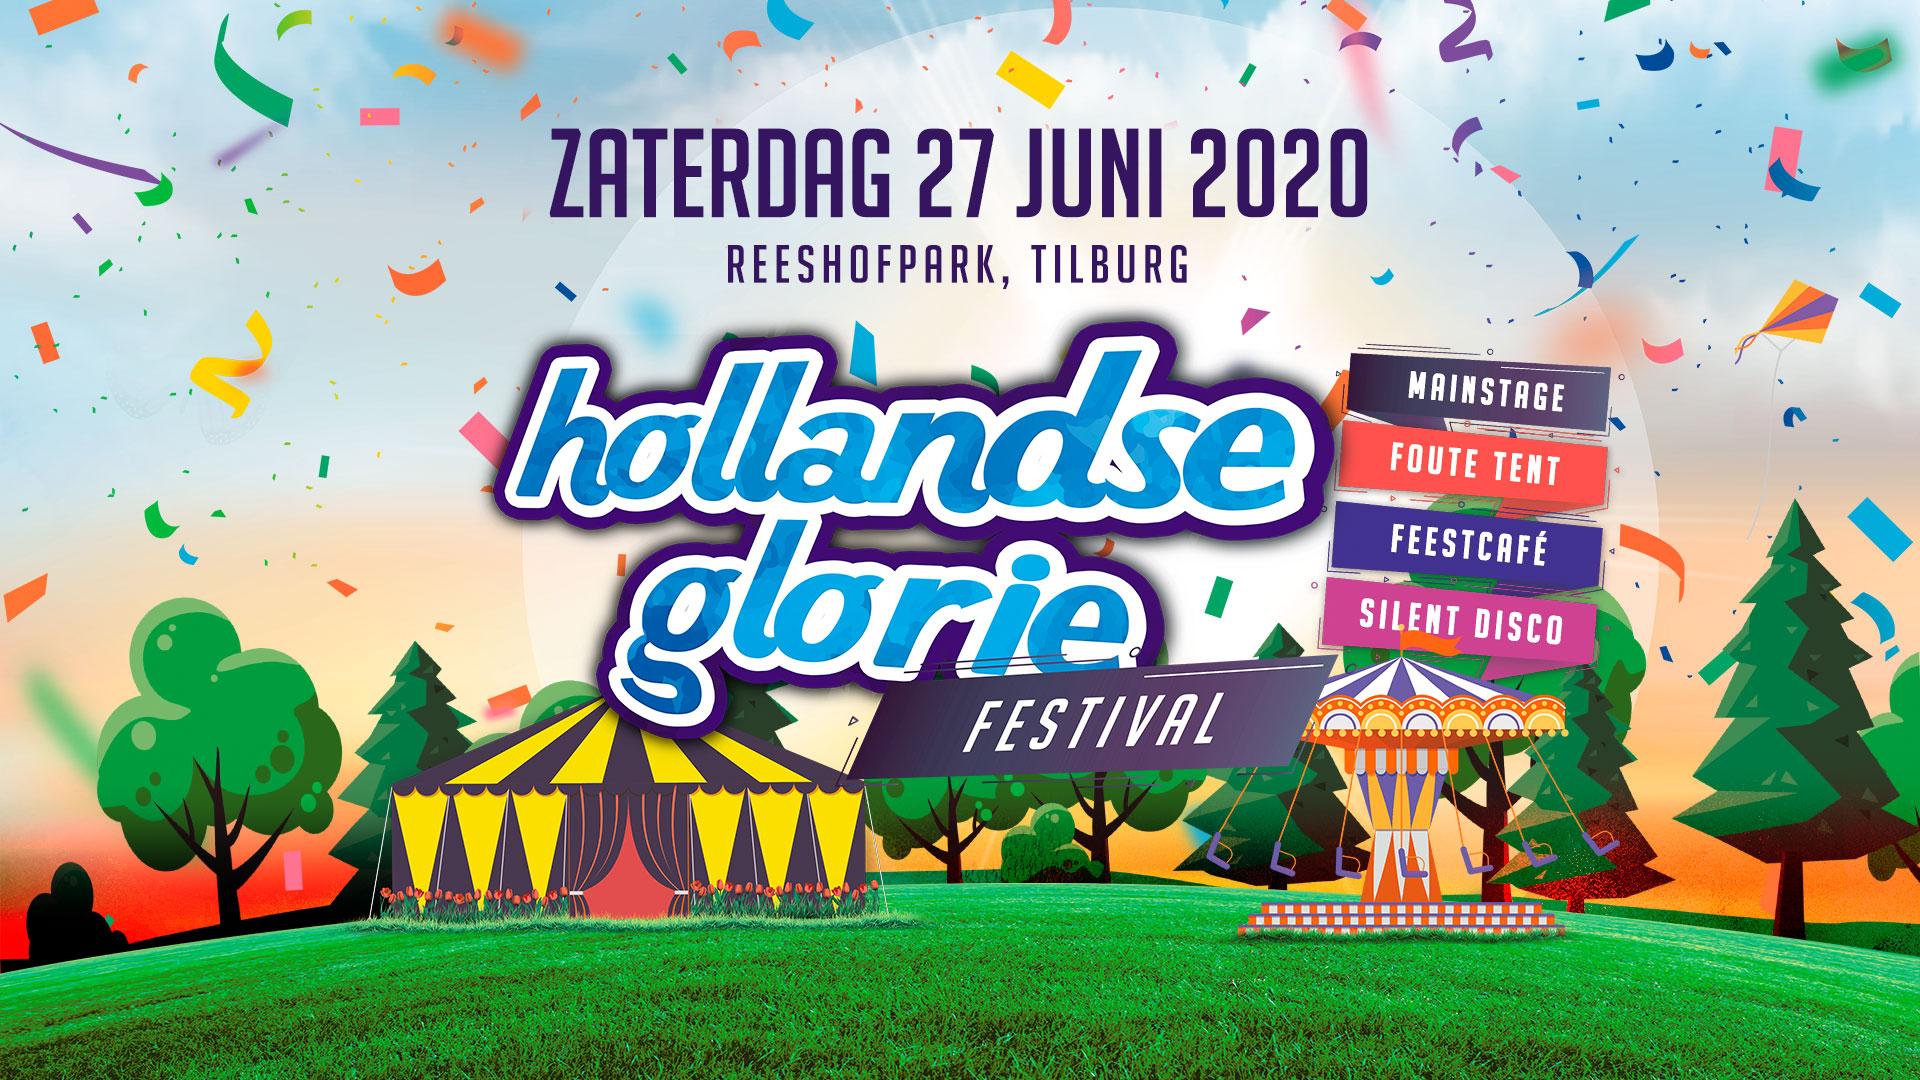 2020-hg-festival-header-1920x1080